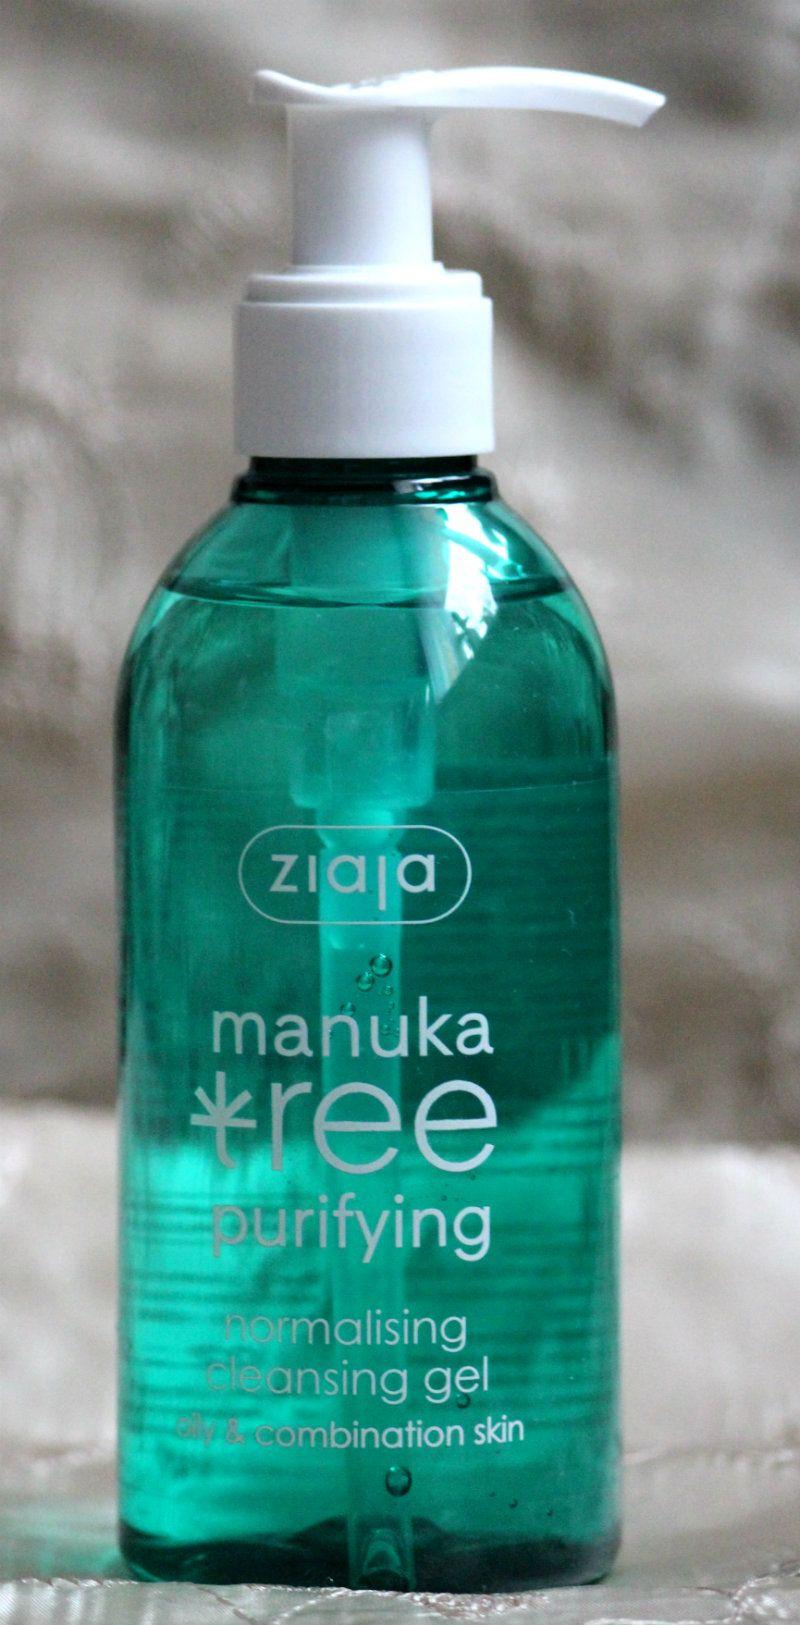 Ziaja Manuka Tree čistiaci gél - KAMzaKRÁSOU.sk #kamzakrasou #cosmetics #ziaja #facegel #manukatree